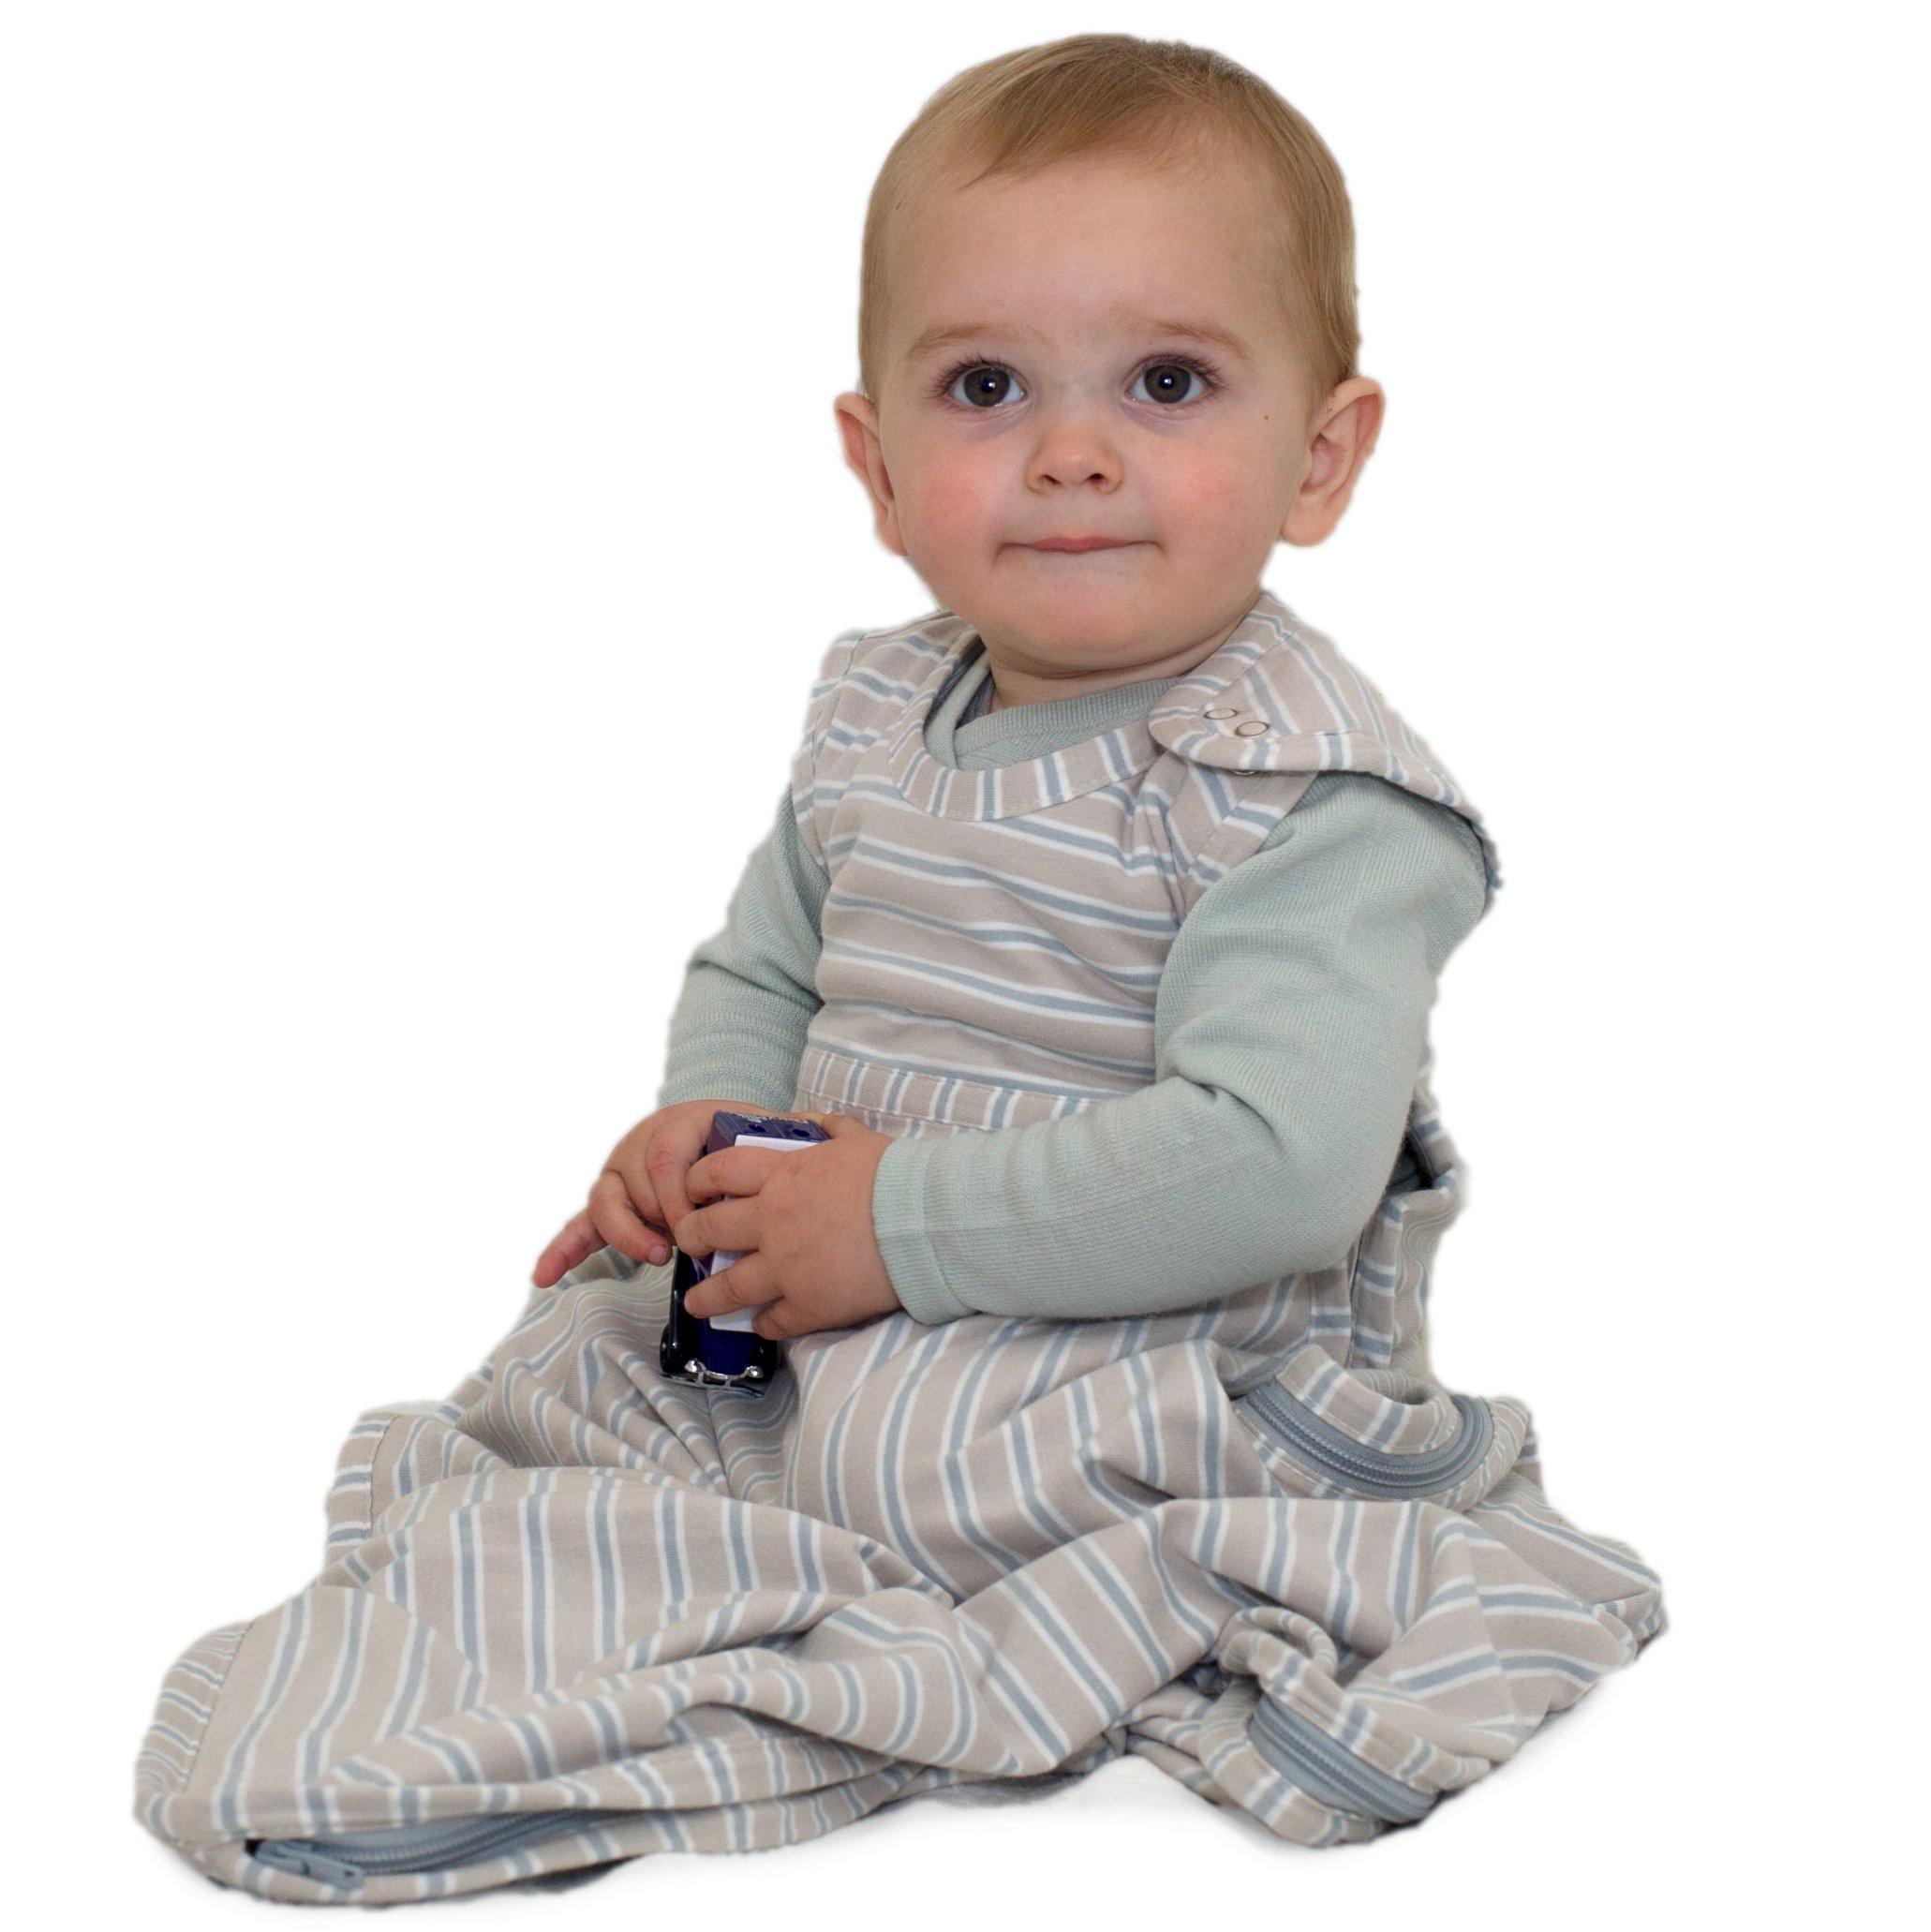 Merino Kids Baby Sleep Bag for Babies 0-2 Years, Light Grey/Grey Stripe